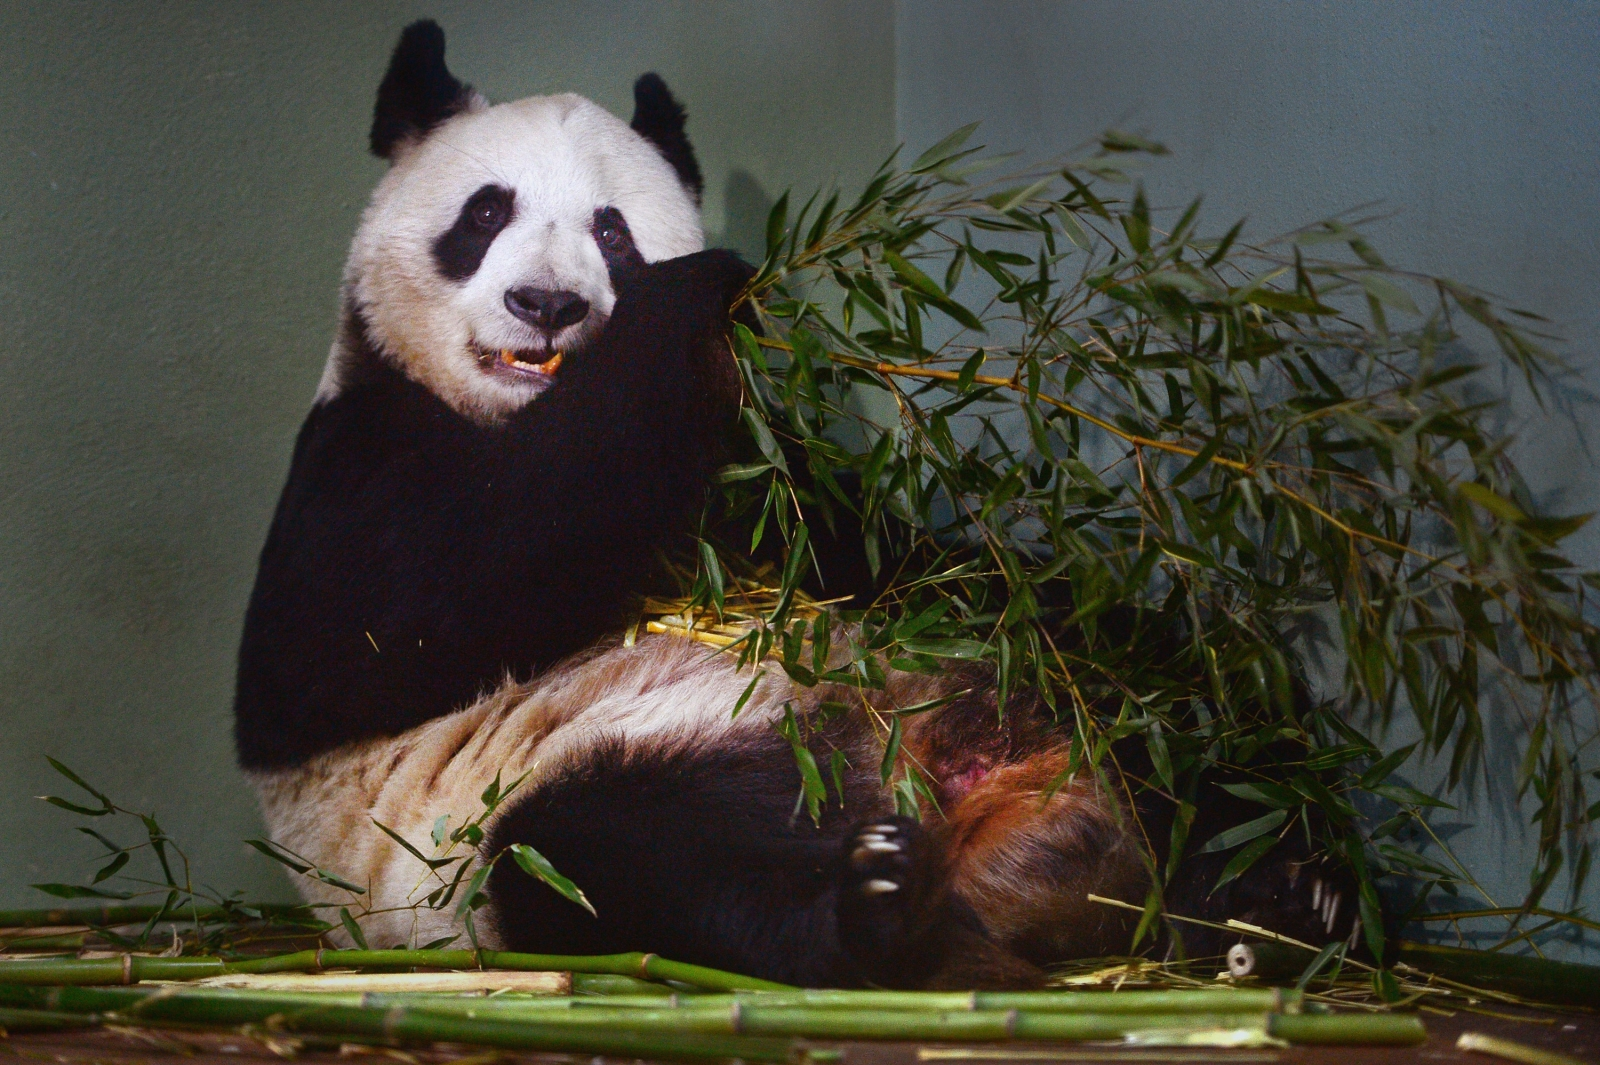 Tian Tian the giant panda may have miscarried, said Edinburgh Zoo